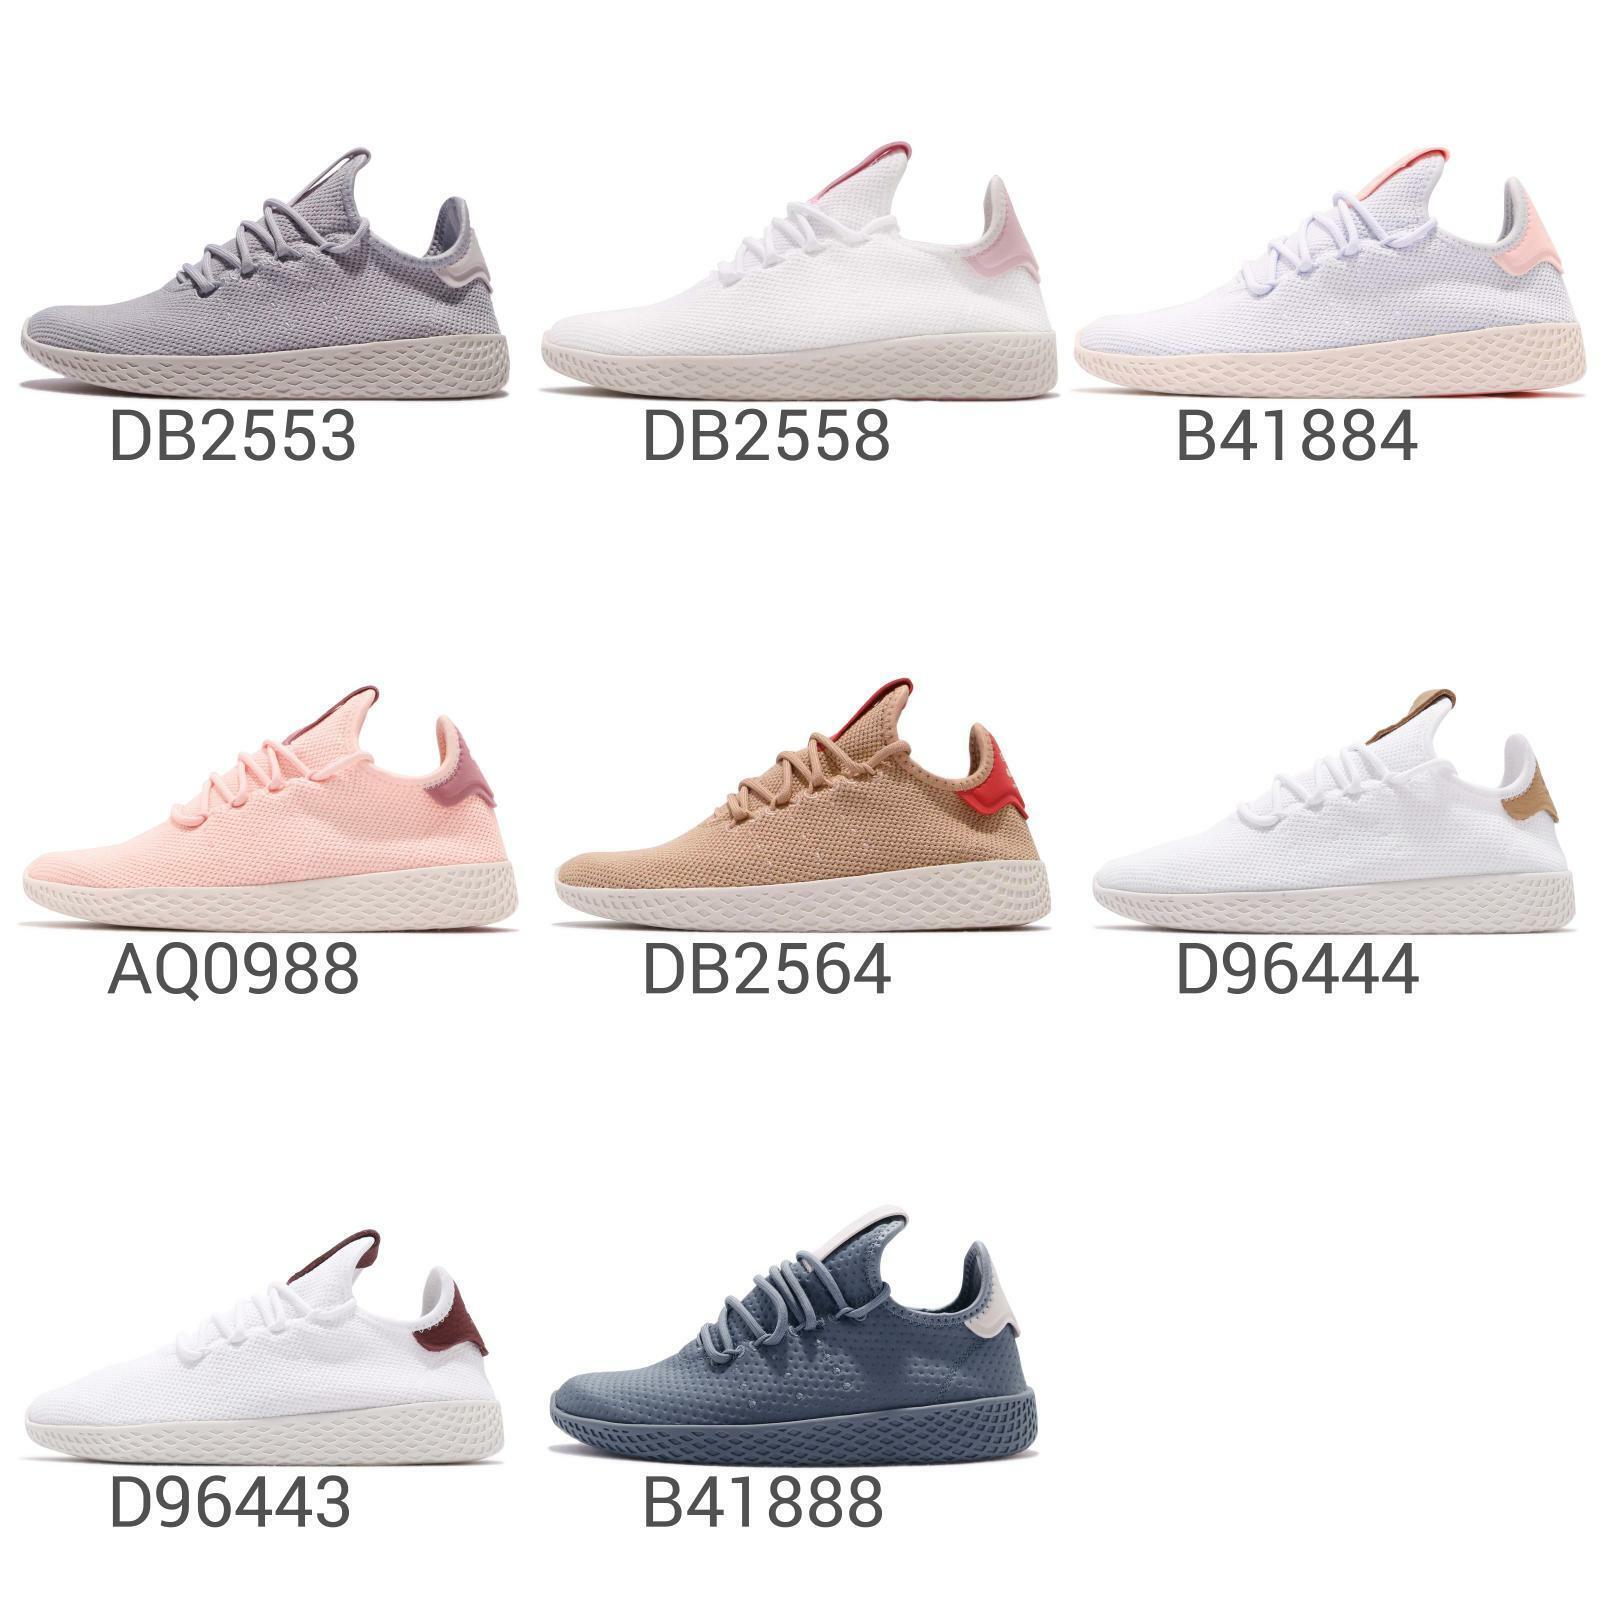 adidas Originals PW Tennis Hu W Pharrell Williams Aero Blue Pink Women B41884